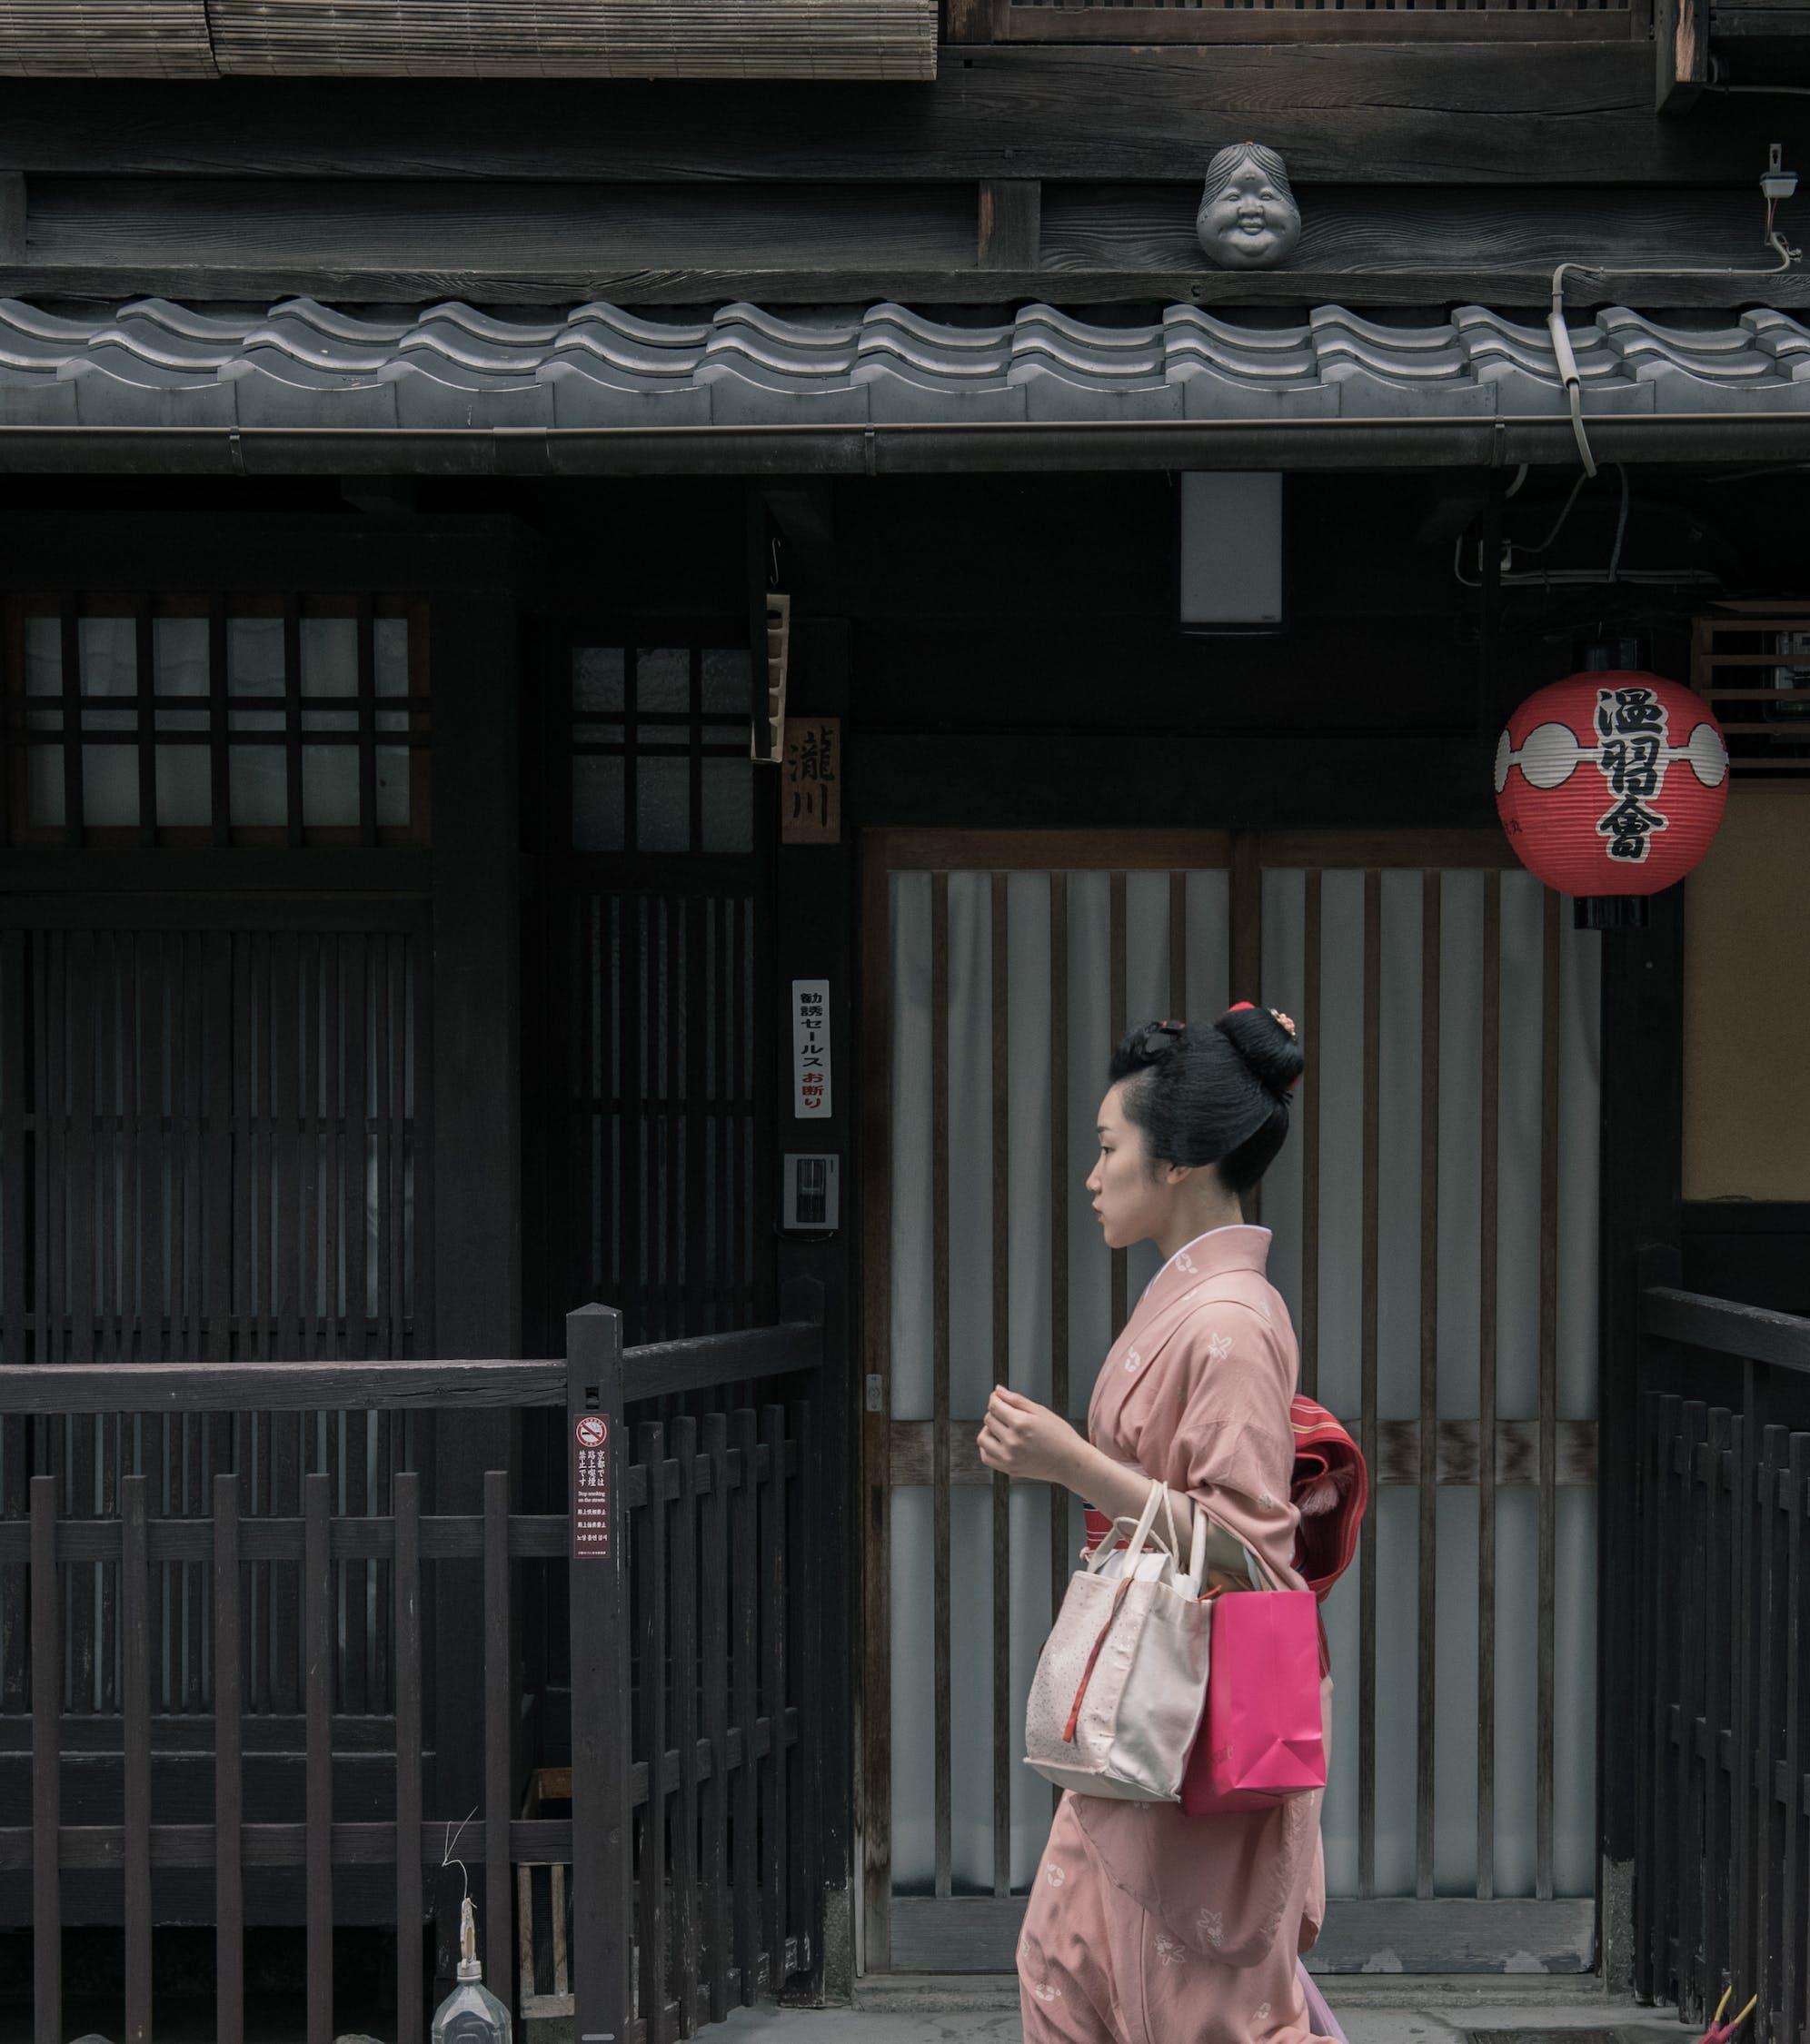 femme, femme asiatique, geisha